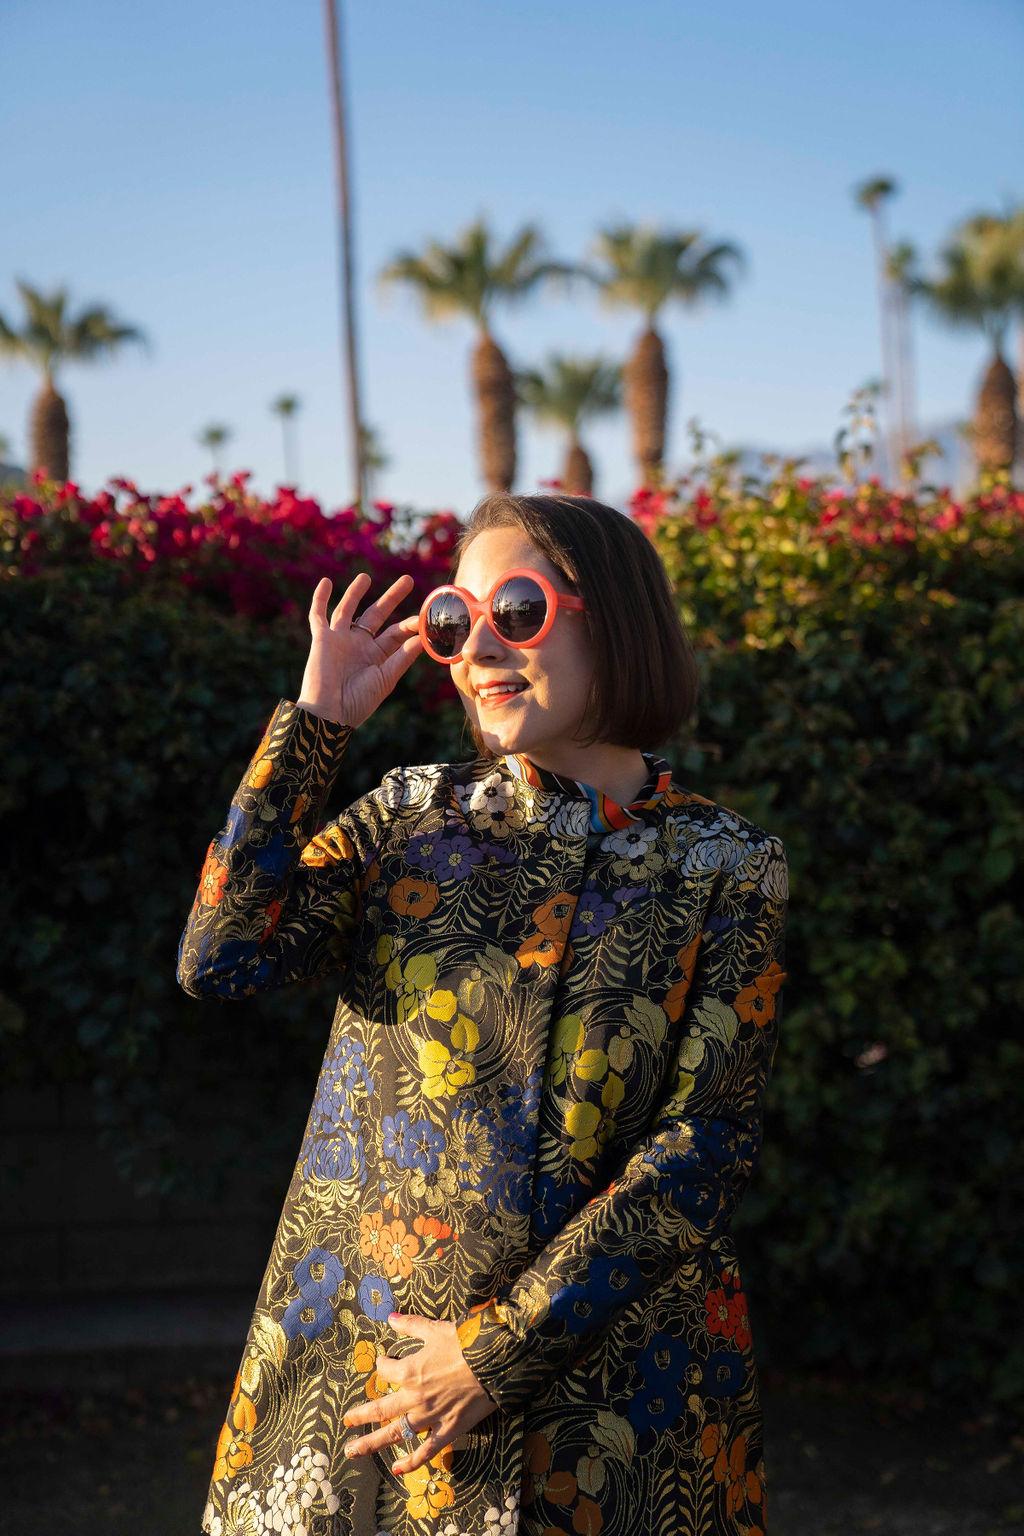 Stylish Round Sunglasses from Friedrich's Optik worn by Charleston blogger Charleston Weekender